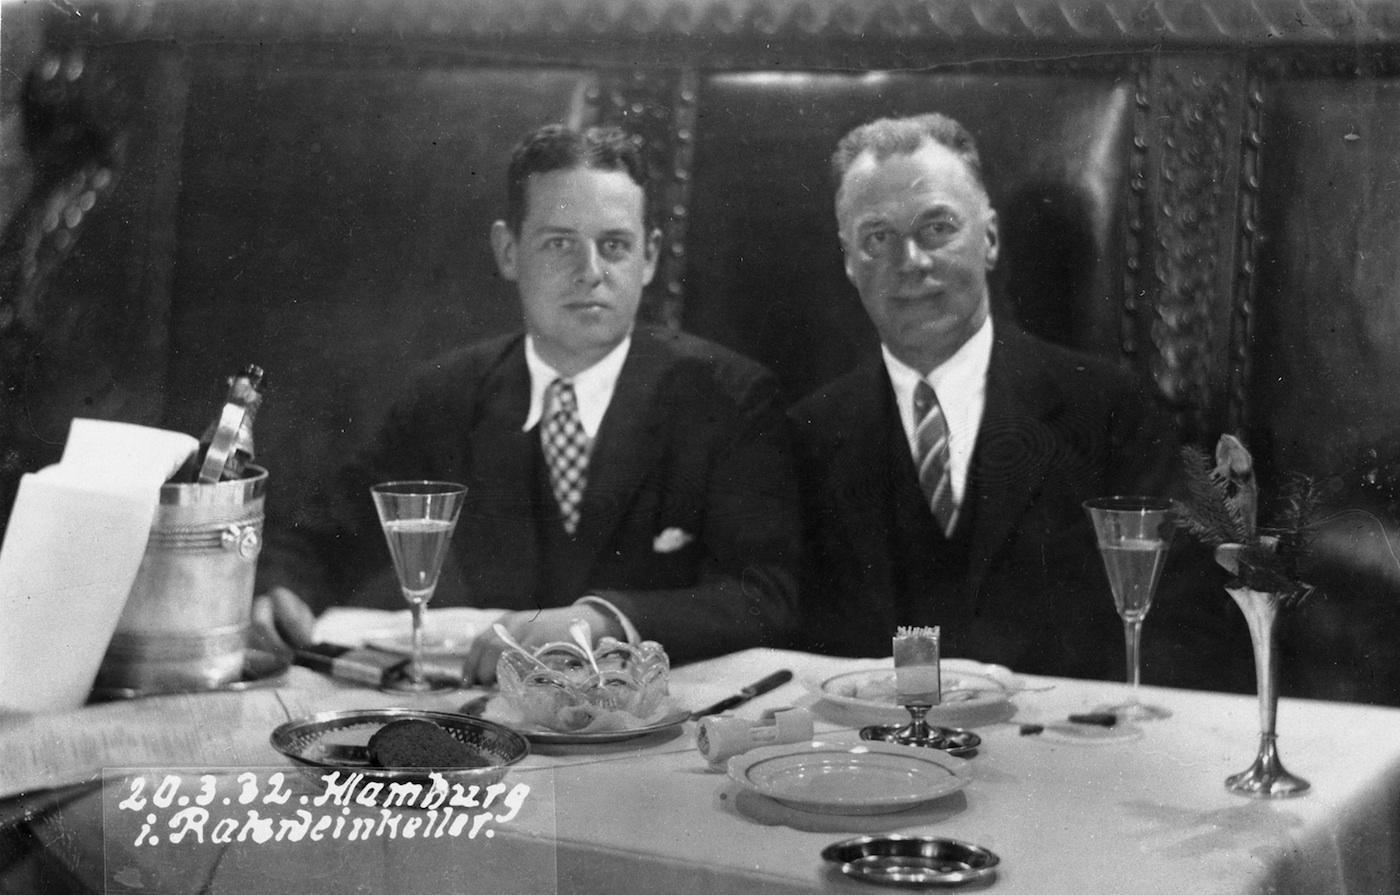 John Gregg and Robert Allerton in Hamburg, 1932. Photo: Courtesy University of Illinois Archives